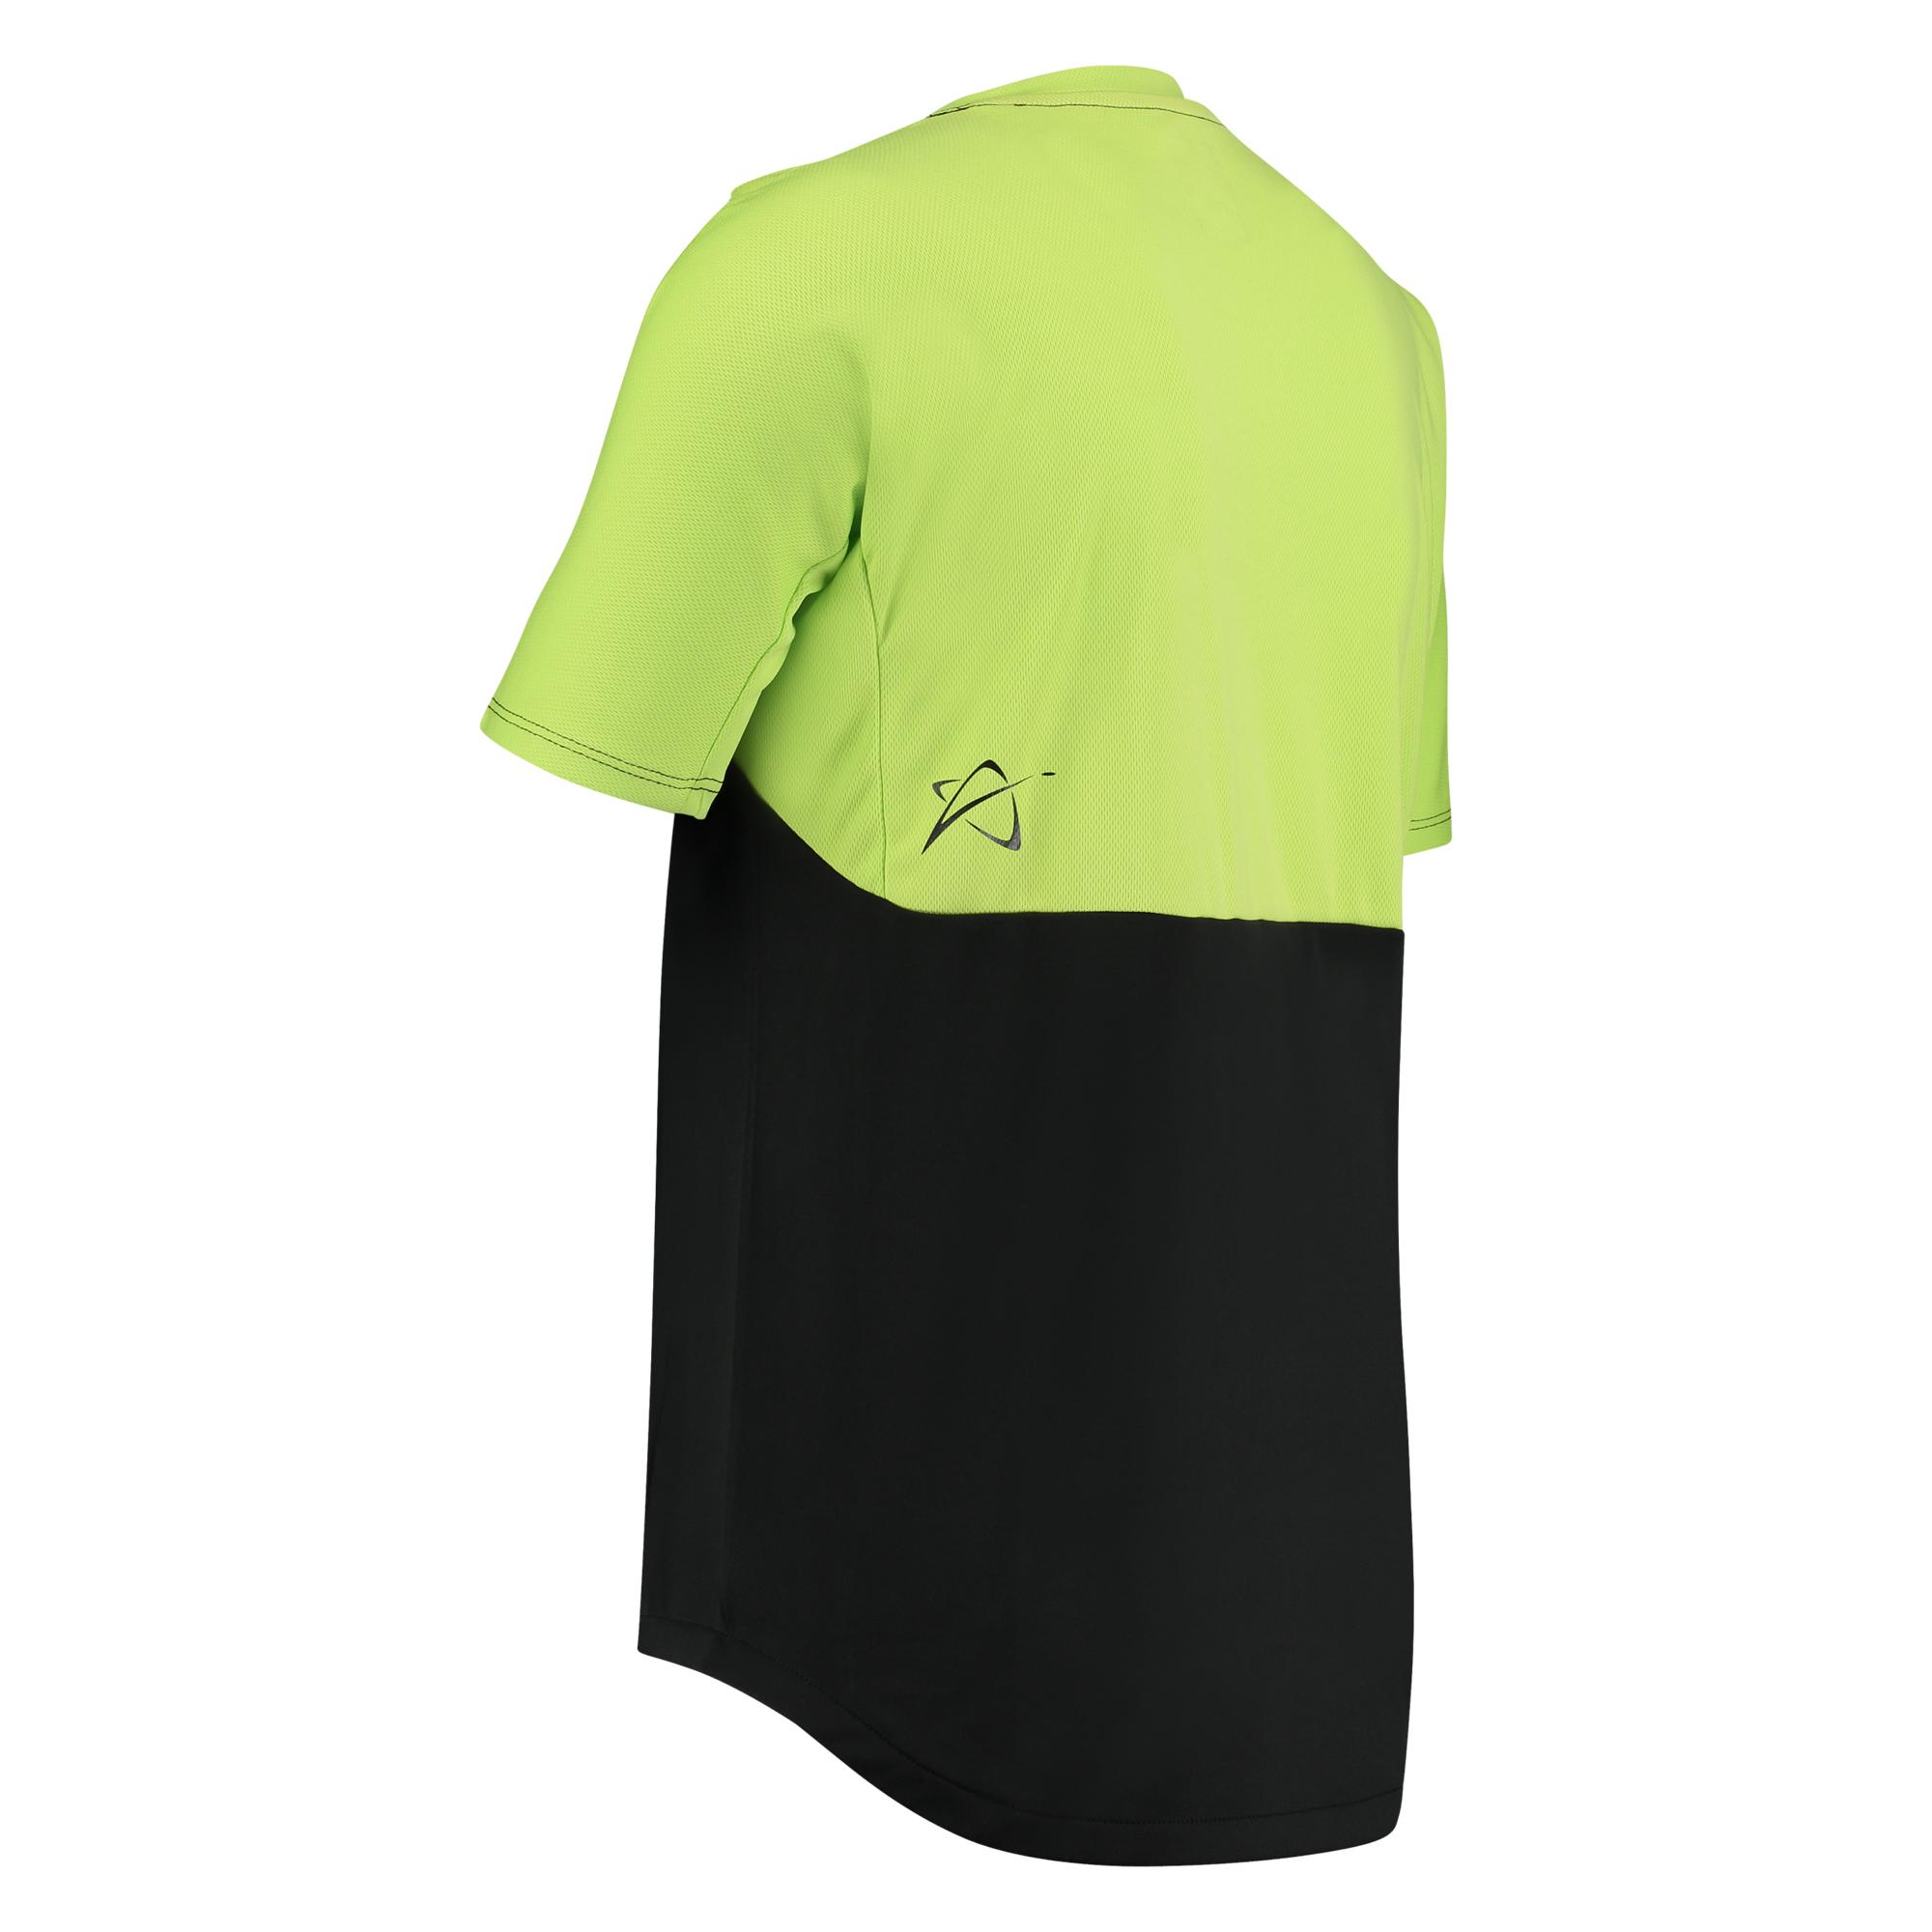 ace top black green side.jpg